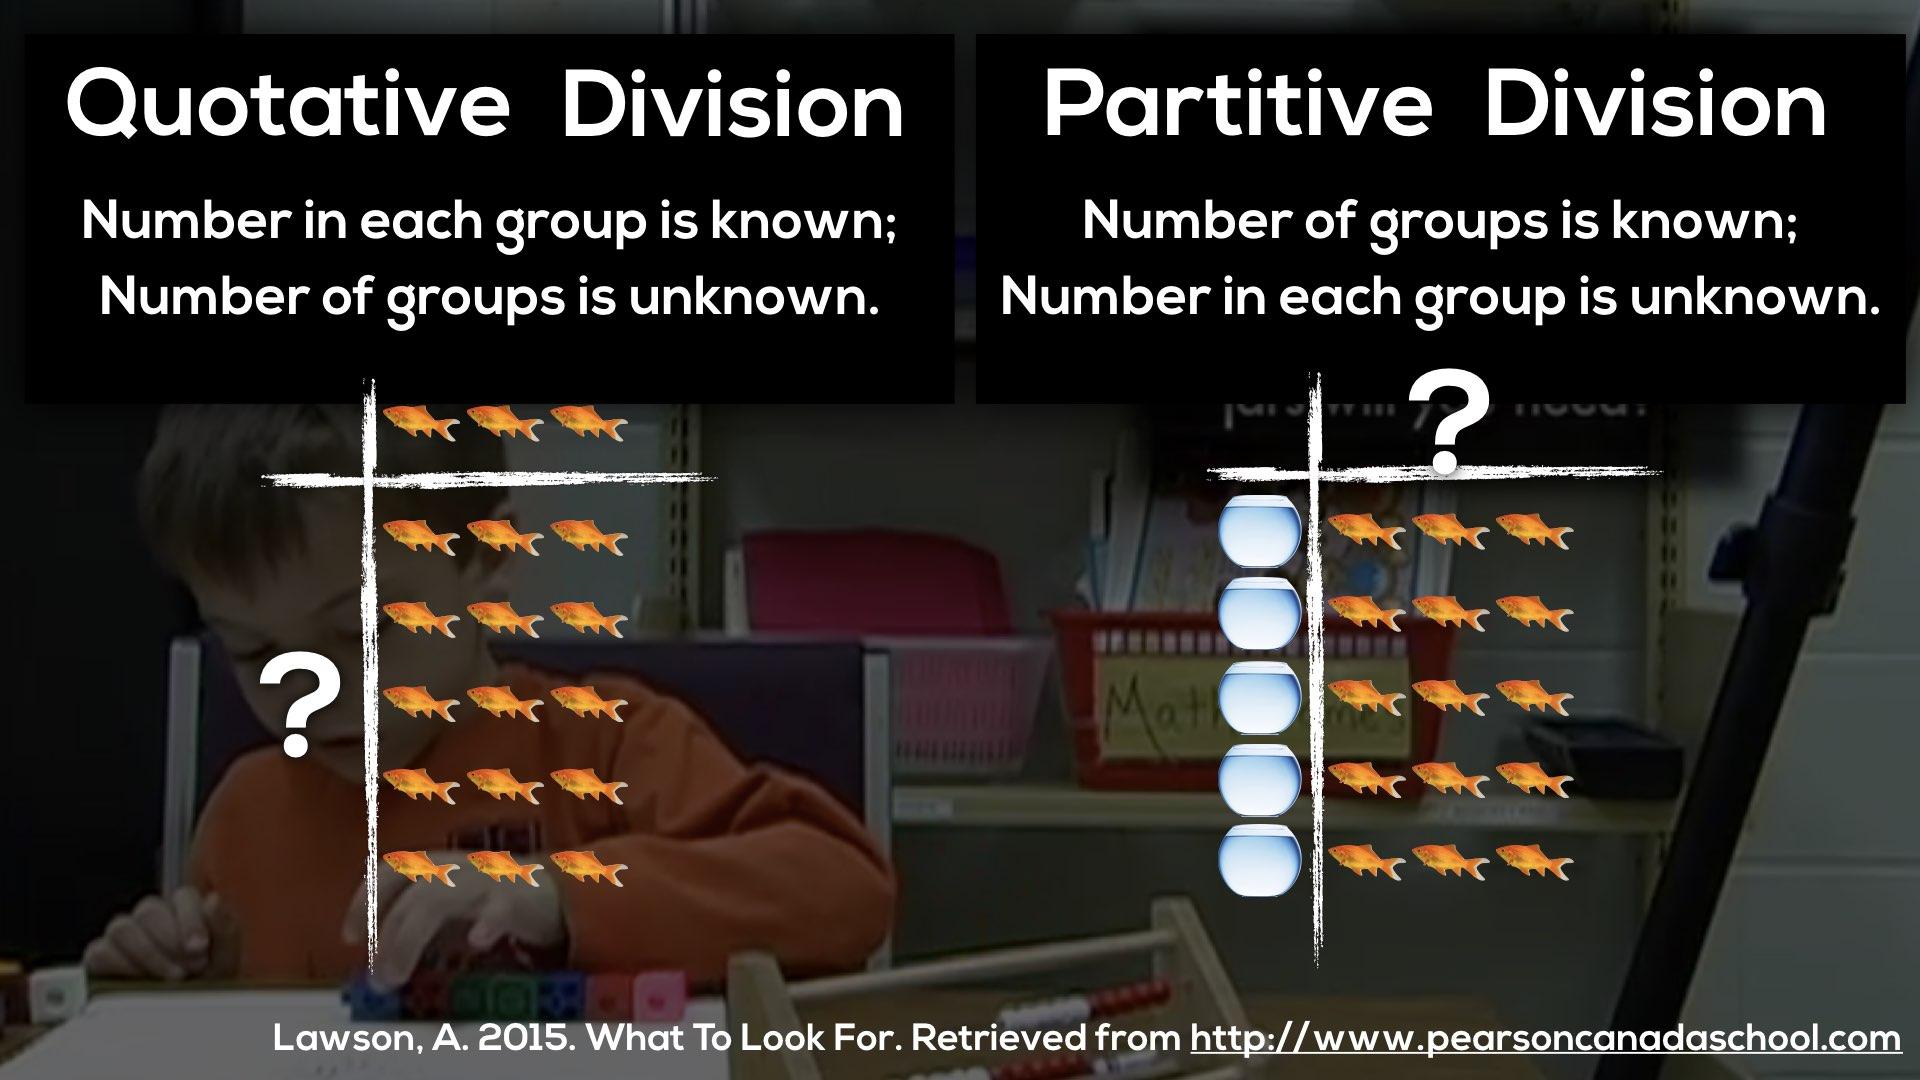 Progression of Division - Summarizing Partitive and Quotative Division